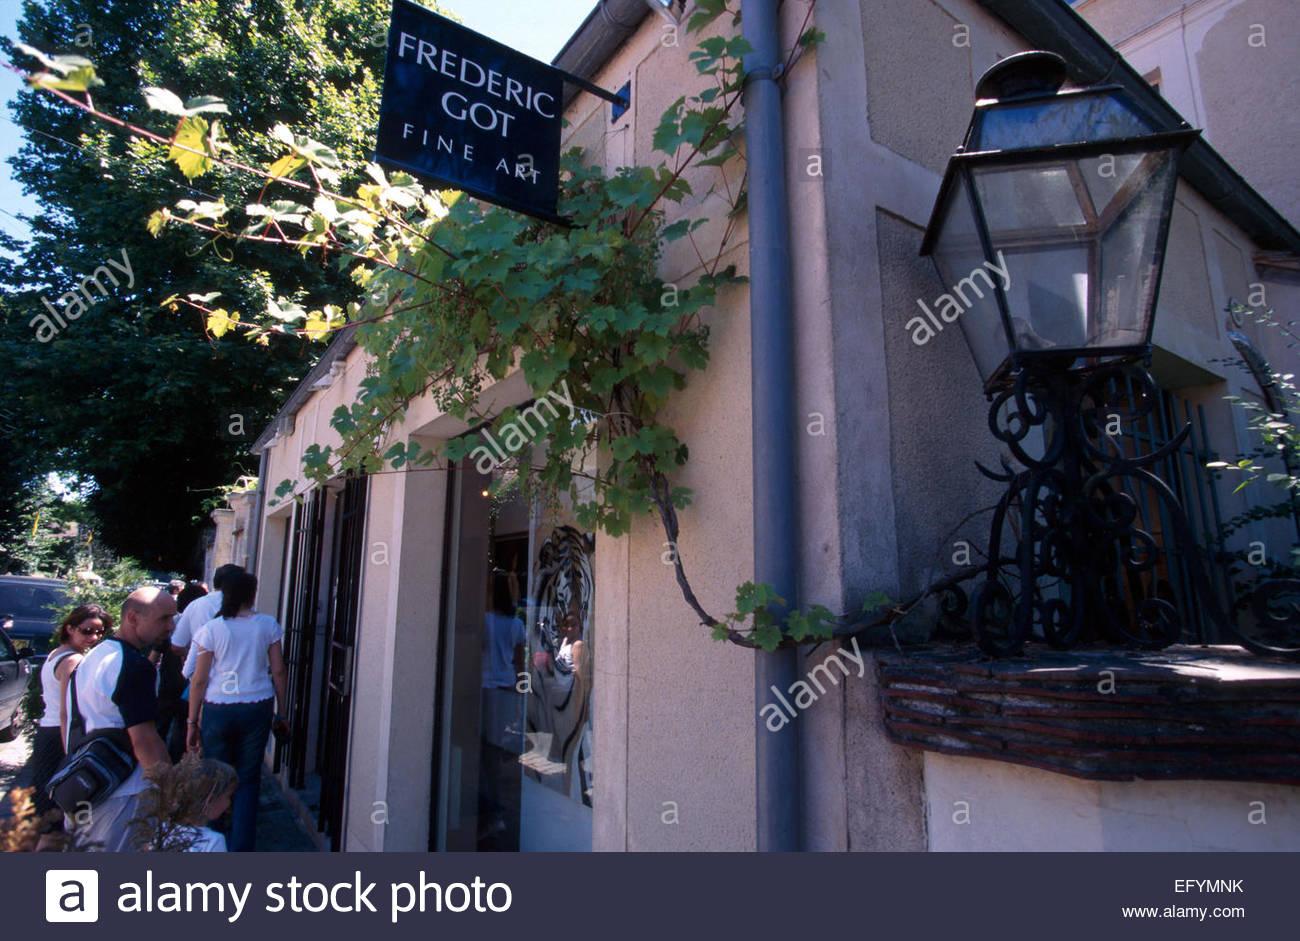 Barbizon, Seine et Marne, The Got gallery - Stock Image